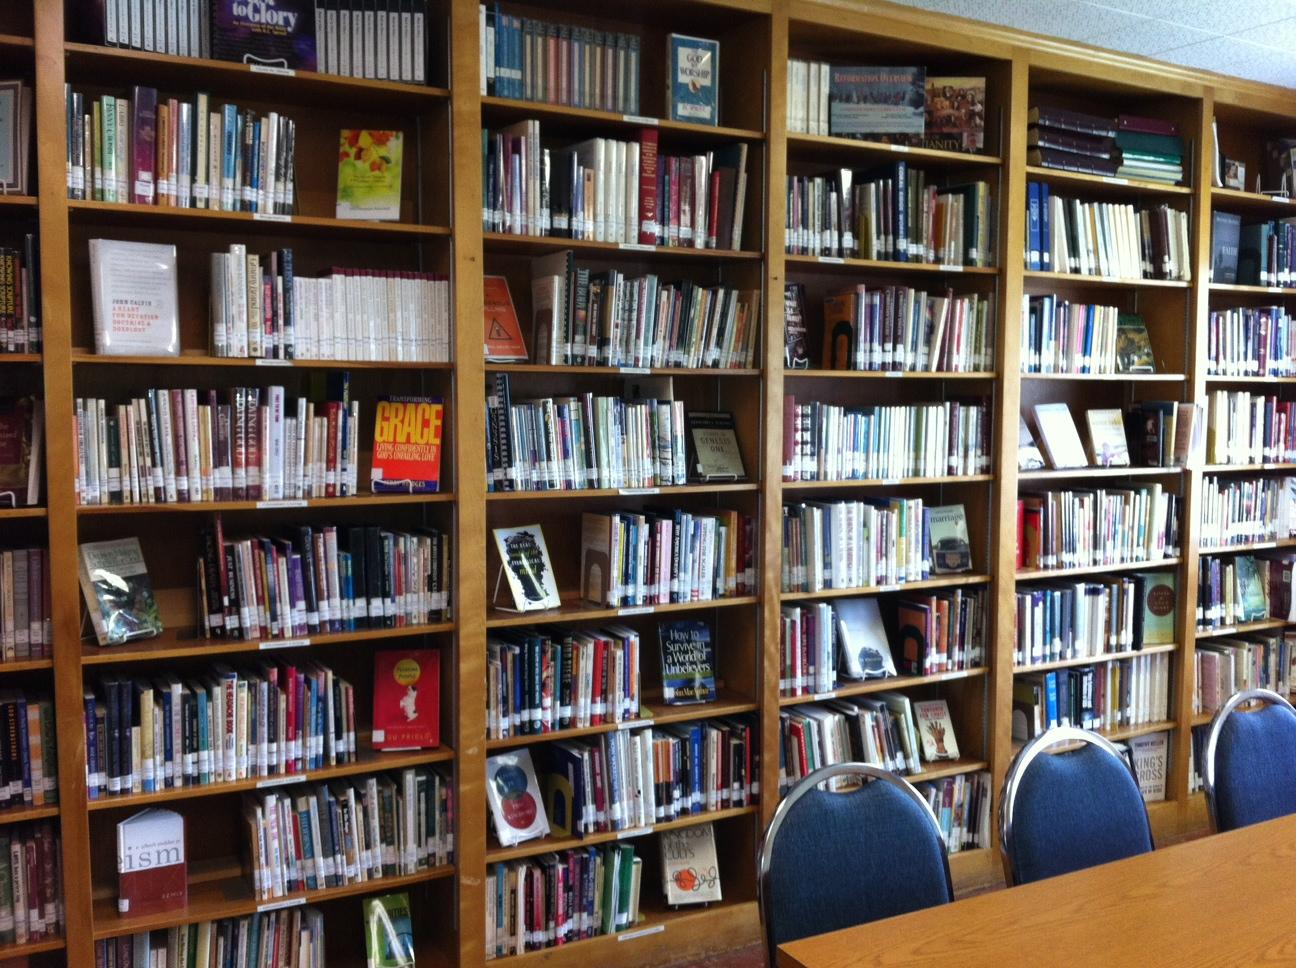 church library.JPG